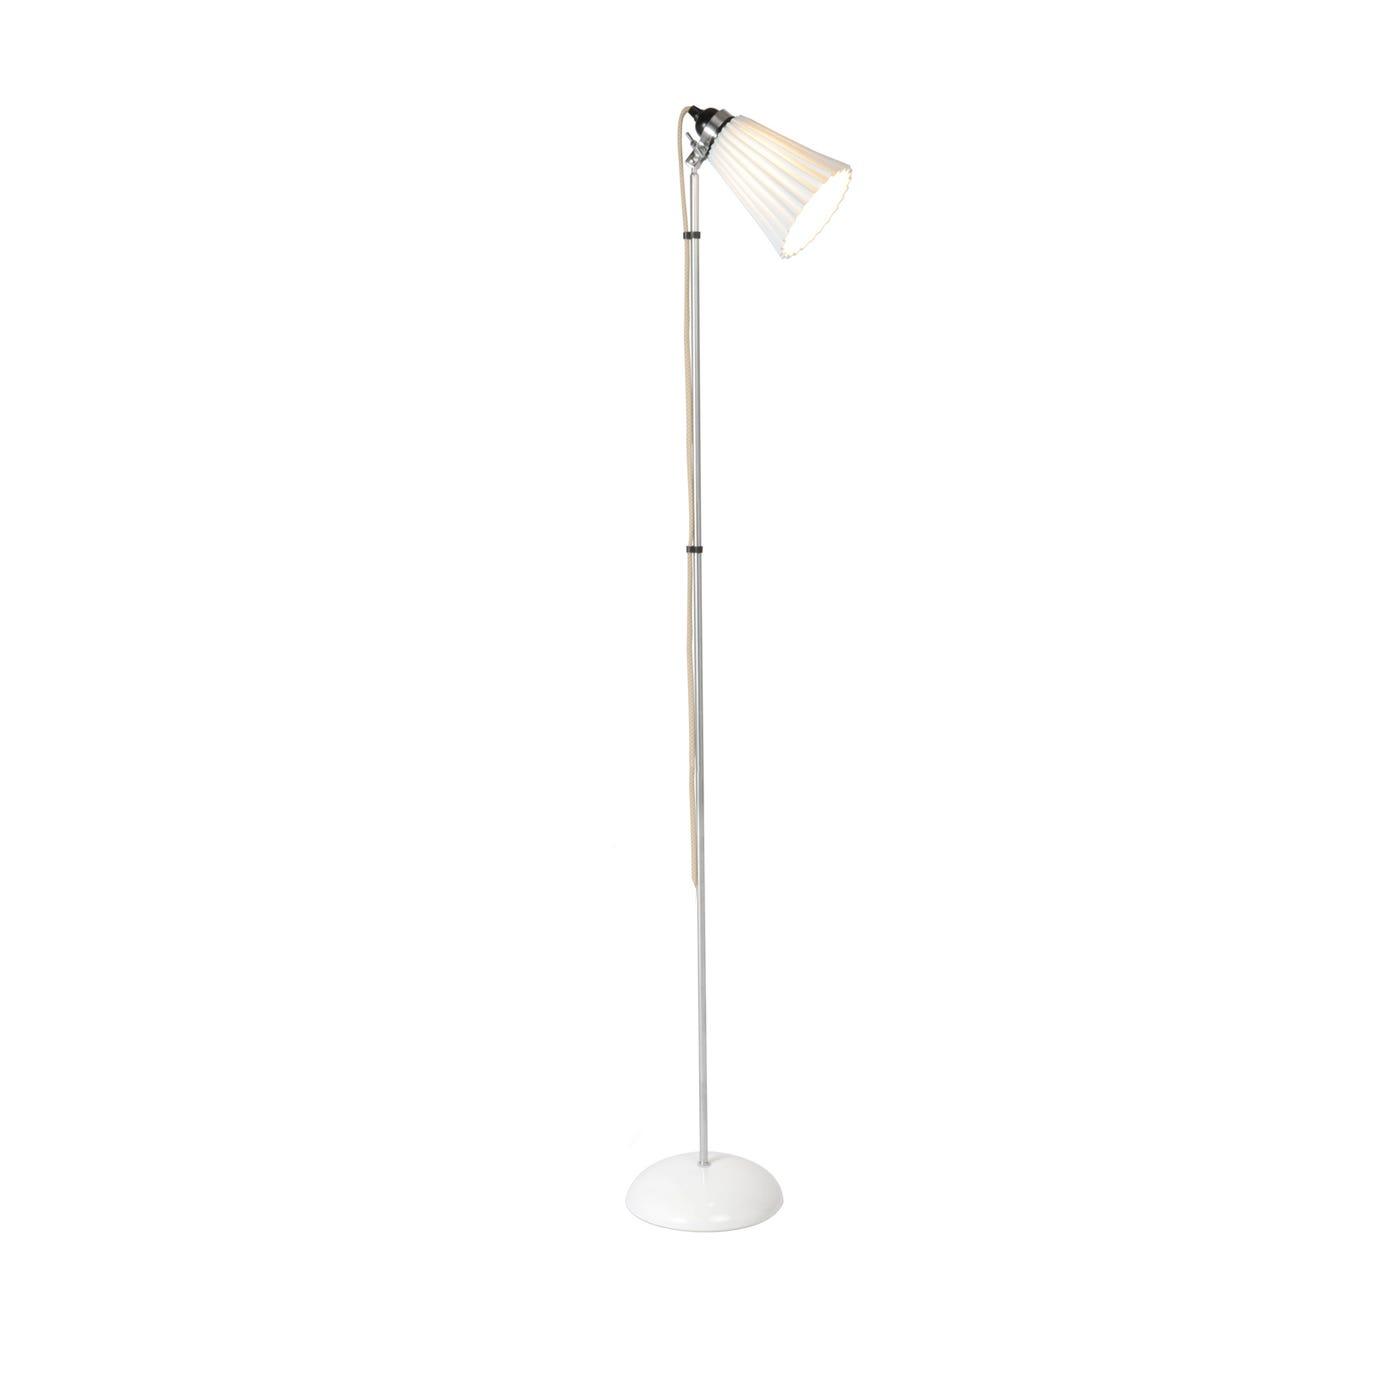 floor lamps modern contemporary floor lamps. Black Bedroom Furniture Sets. Home Design Ideas